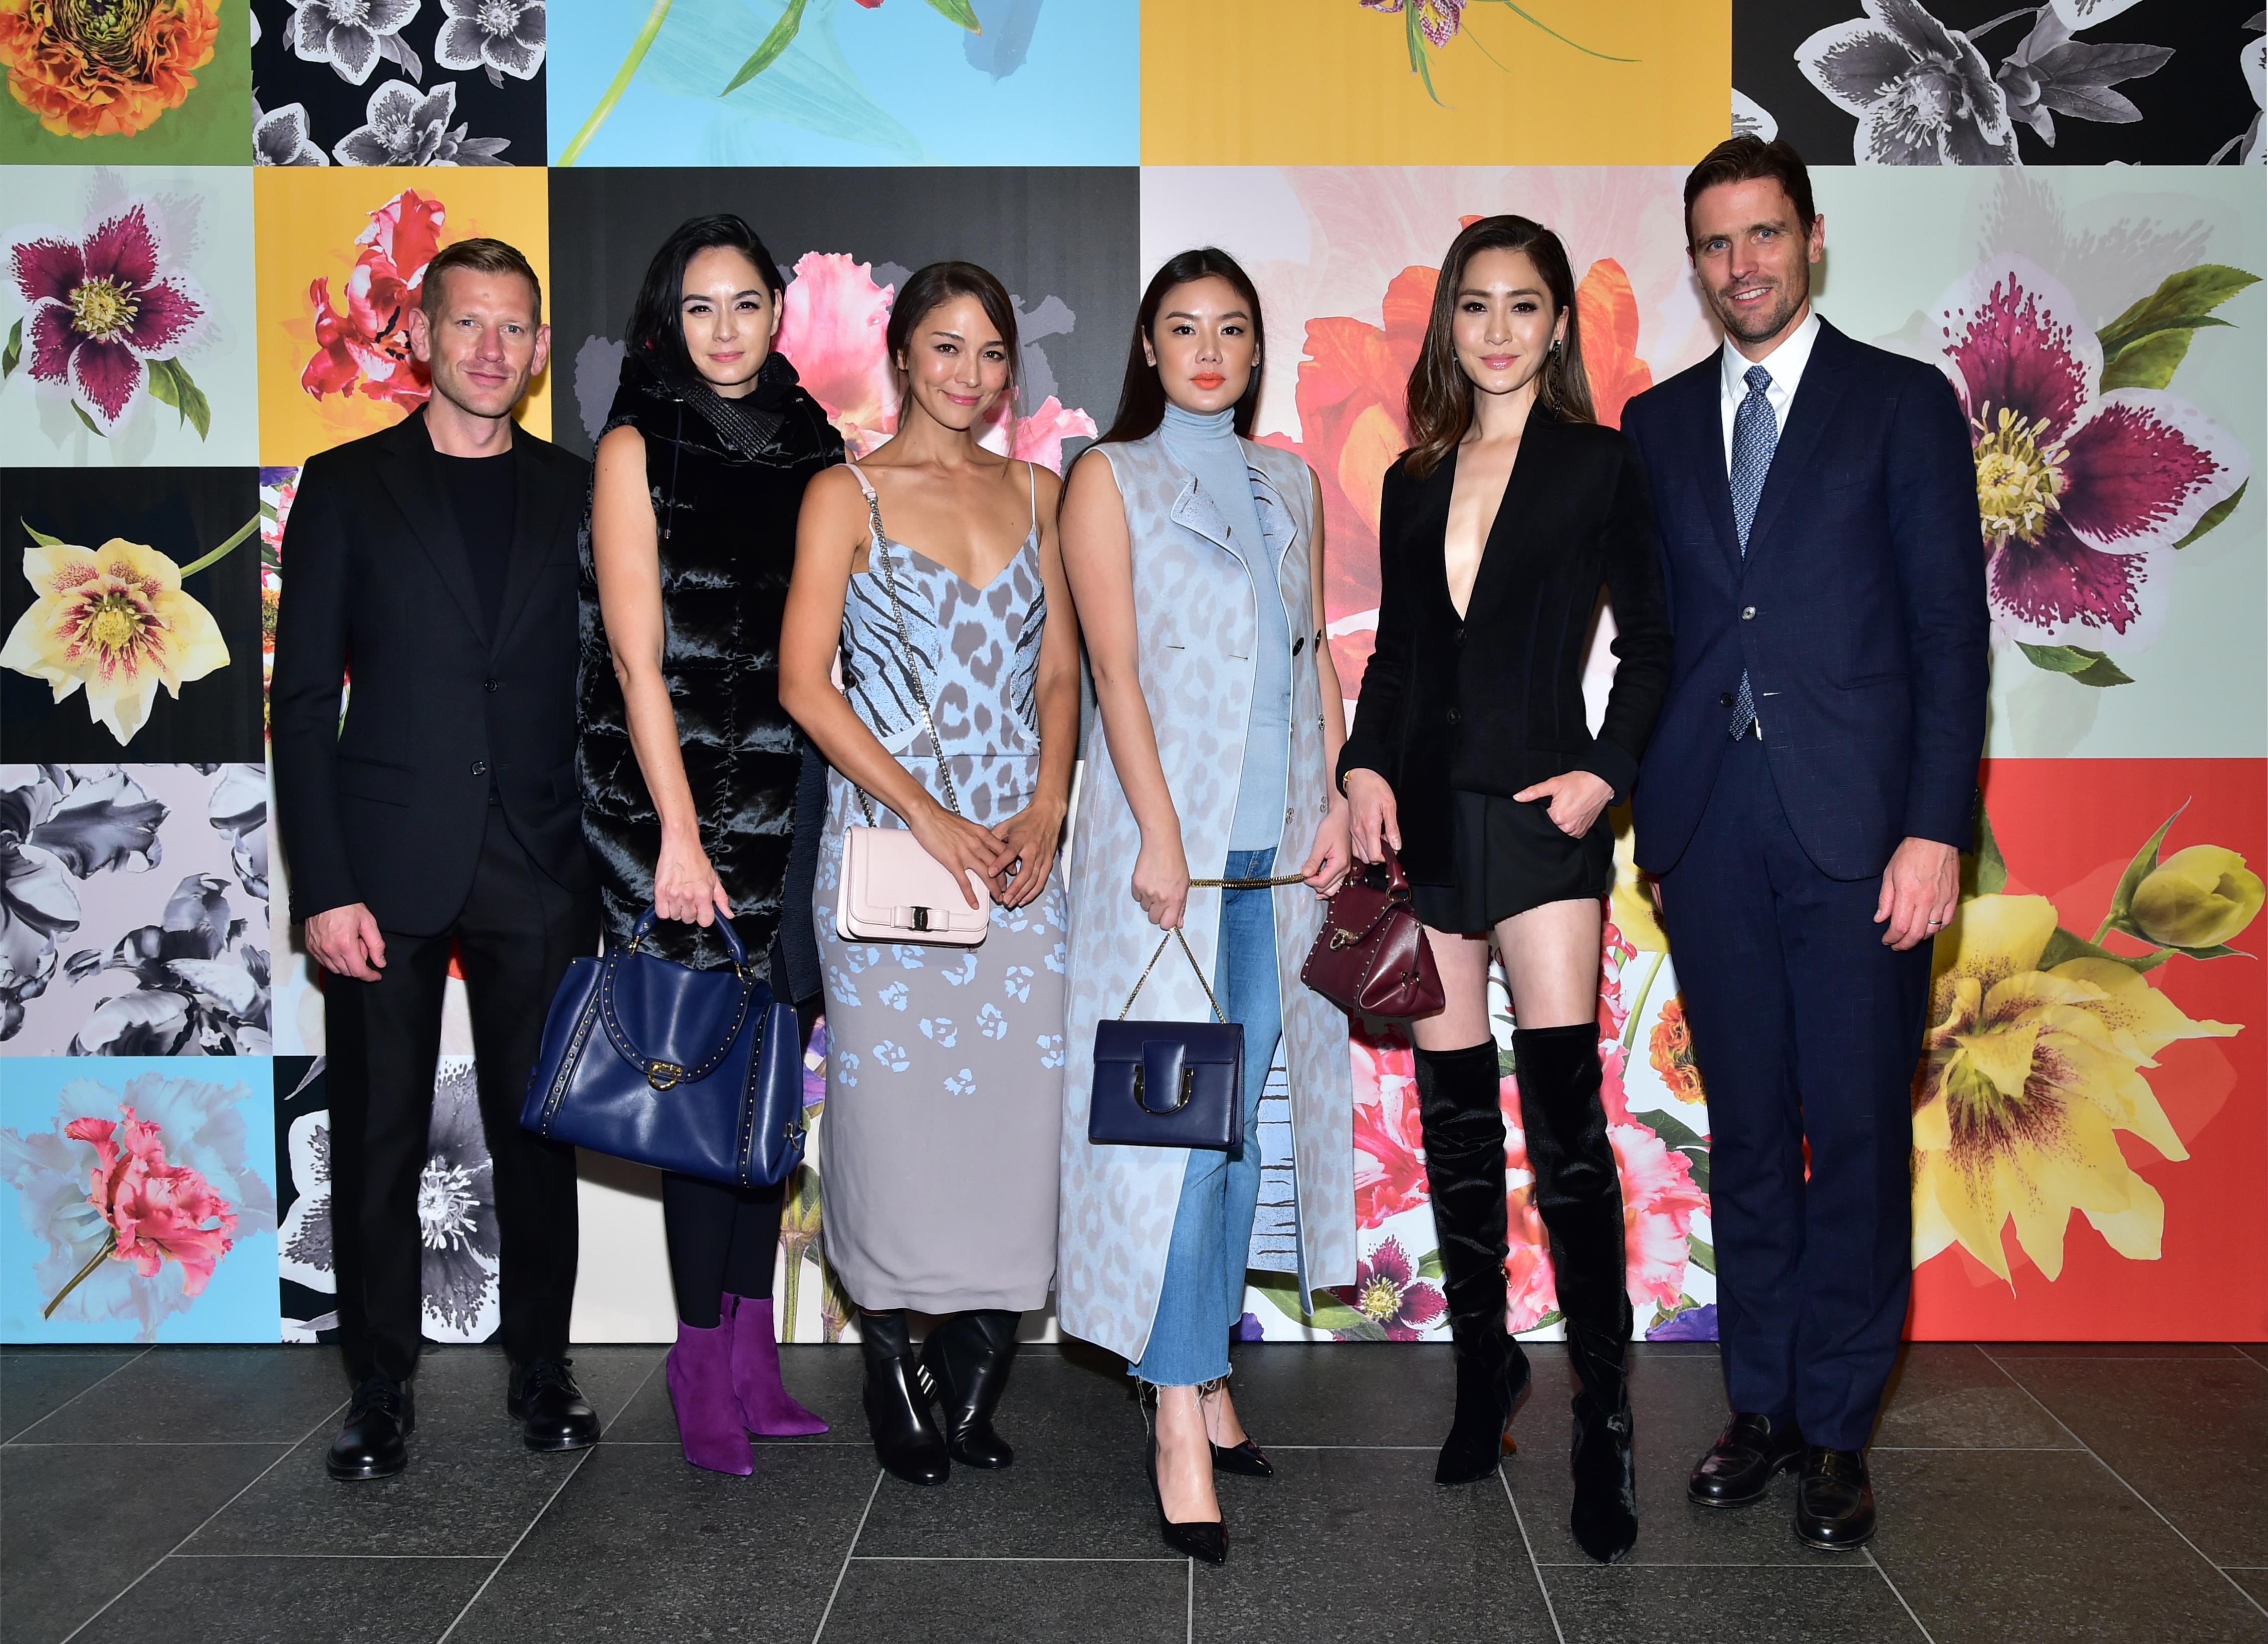 Paul Andrew, Ana R, Cara G, Gaile Lok, Kathy Chow, James Ferragamo